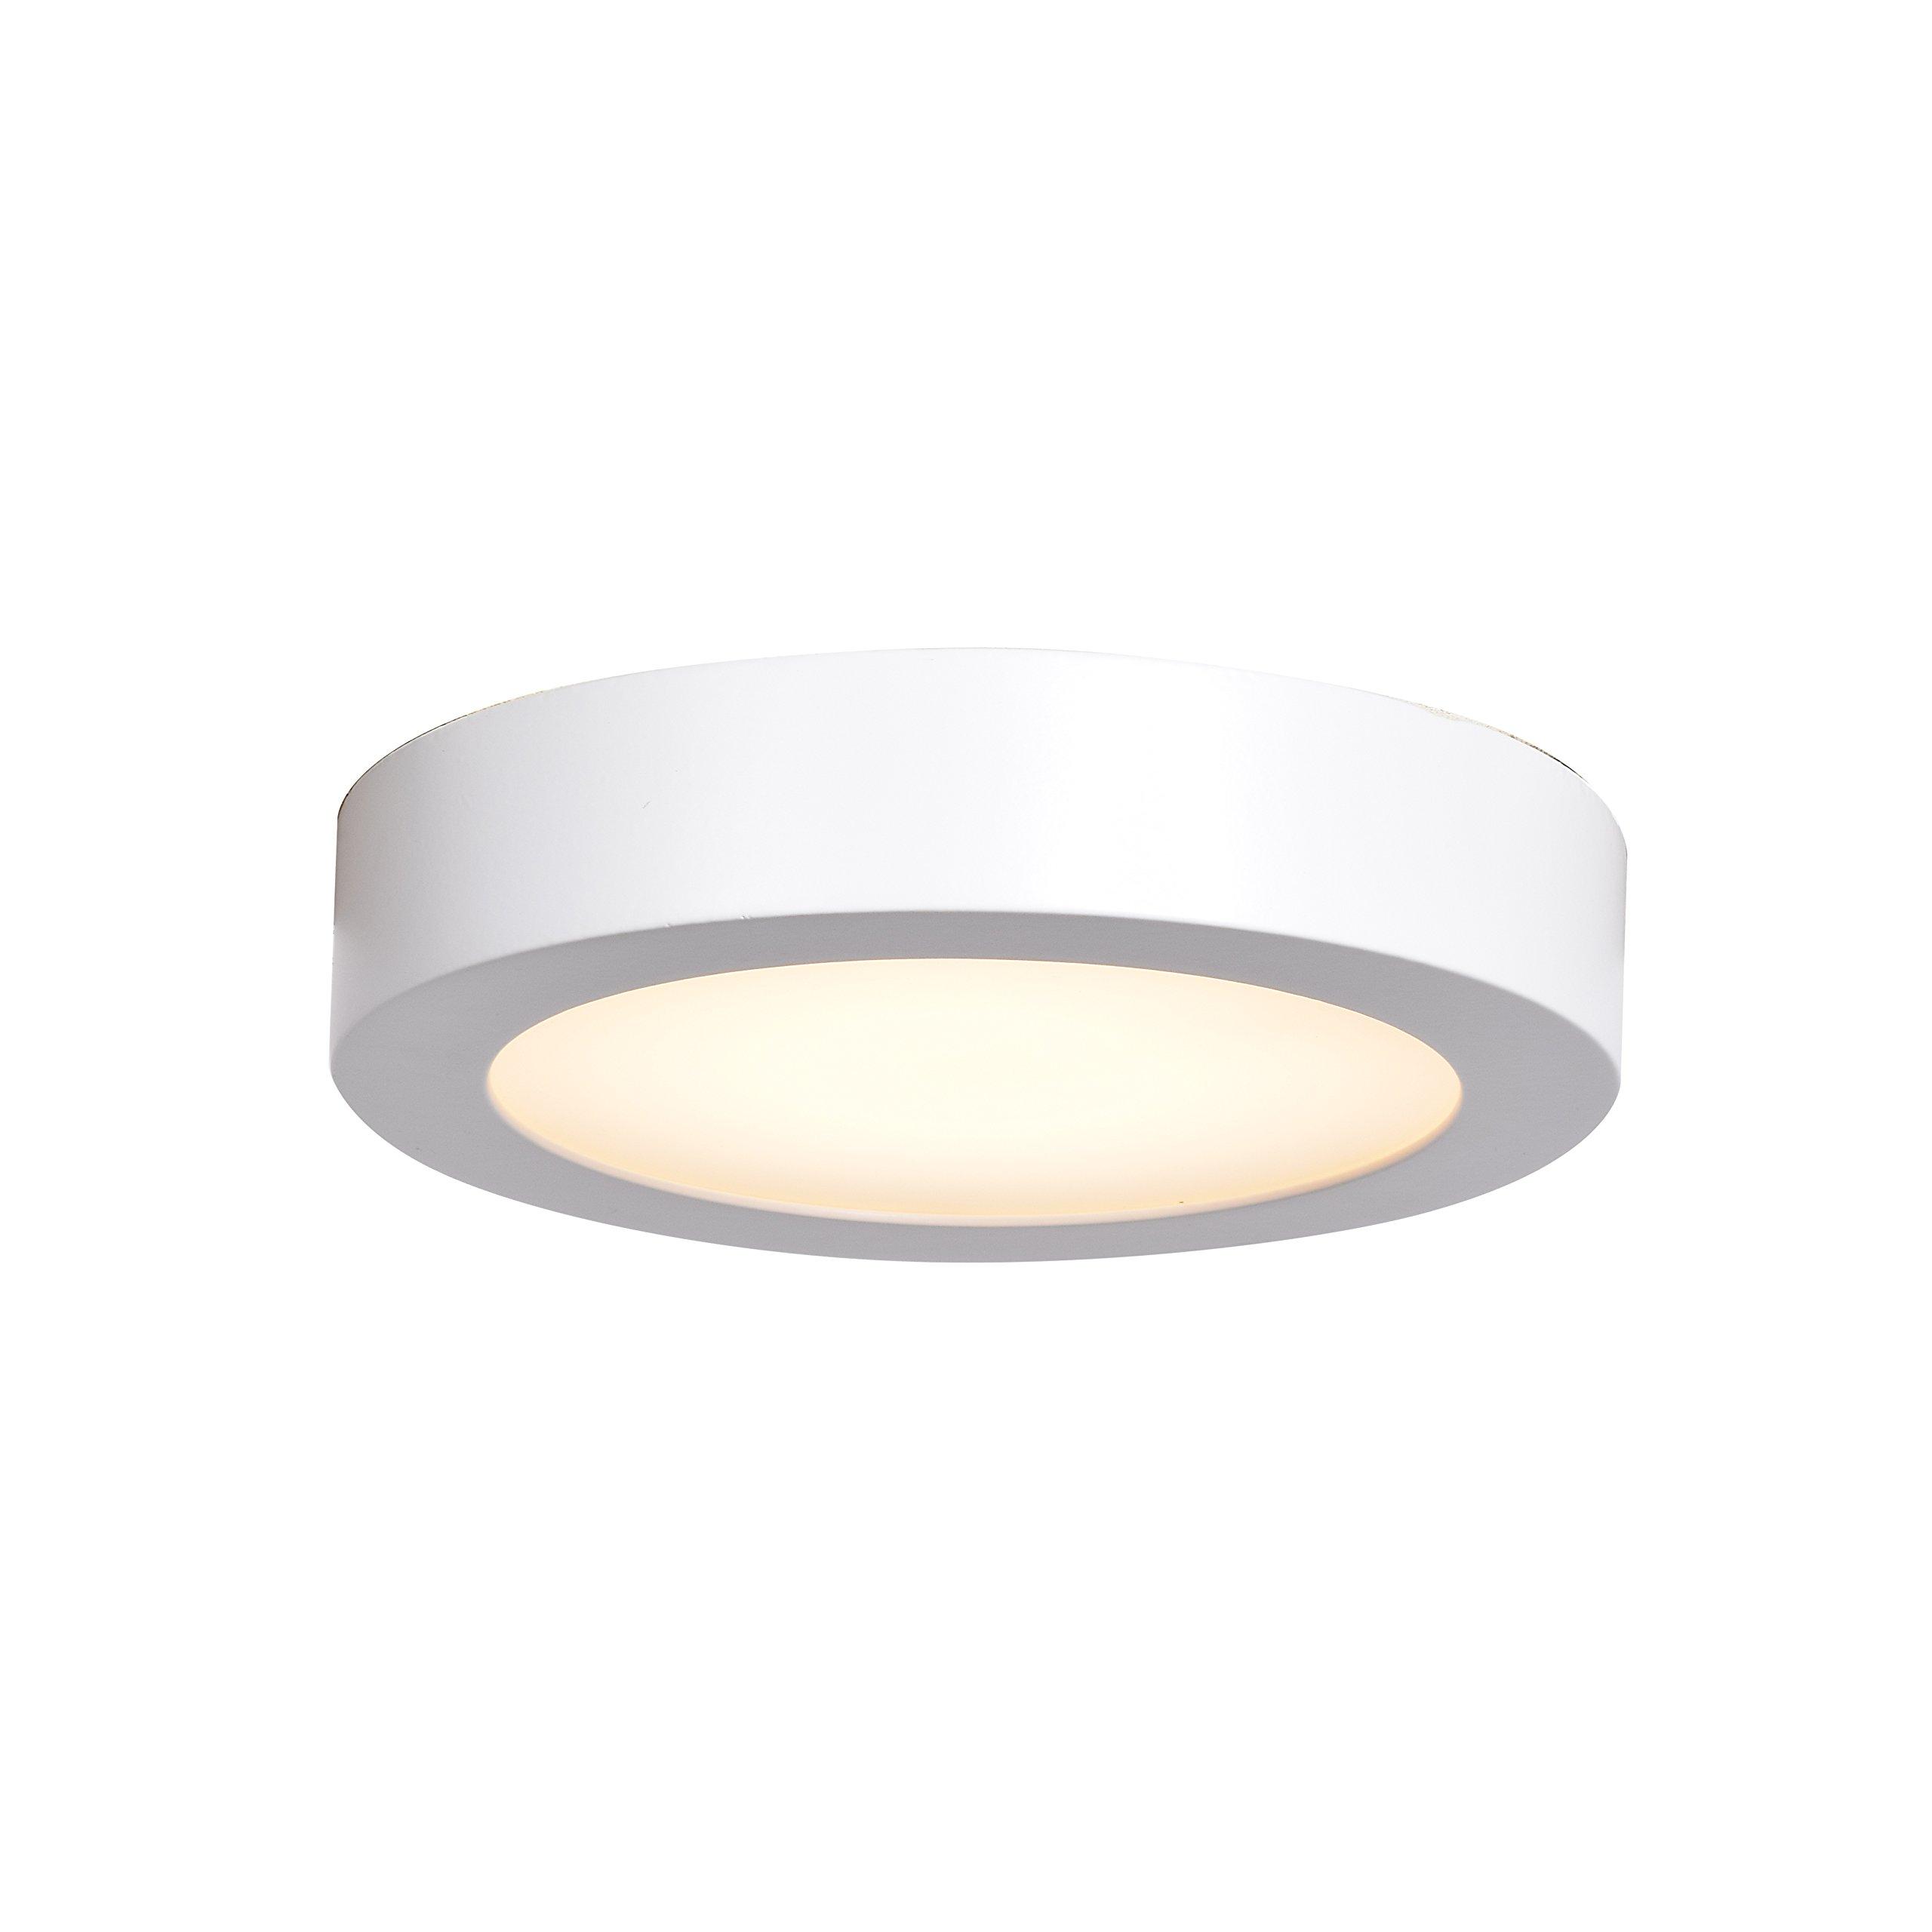 Ulko Exterior LED Outdoor Flush Mount - 7'' D - White - Acrylic Lens Diffuser